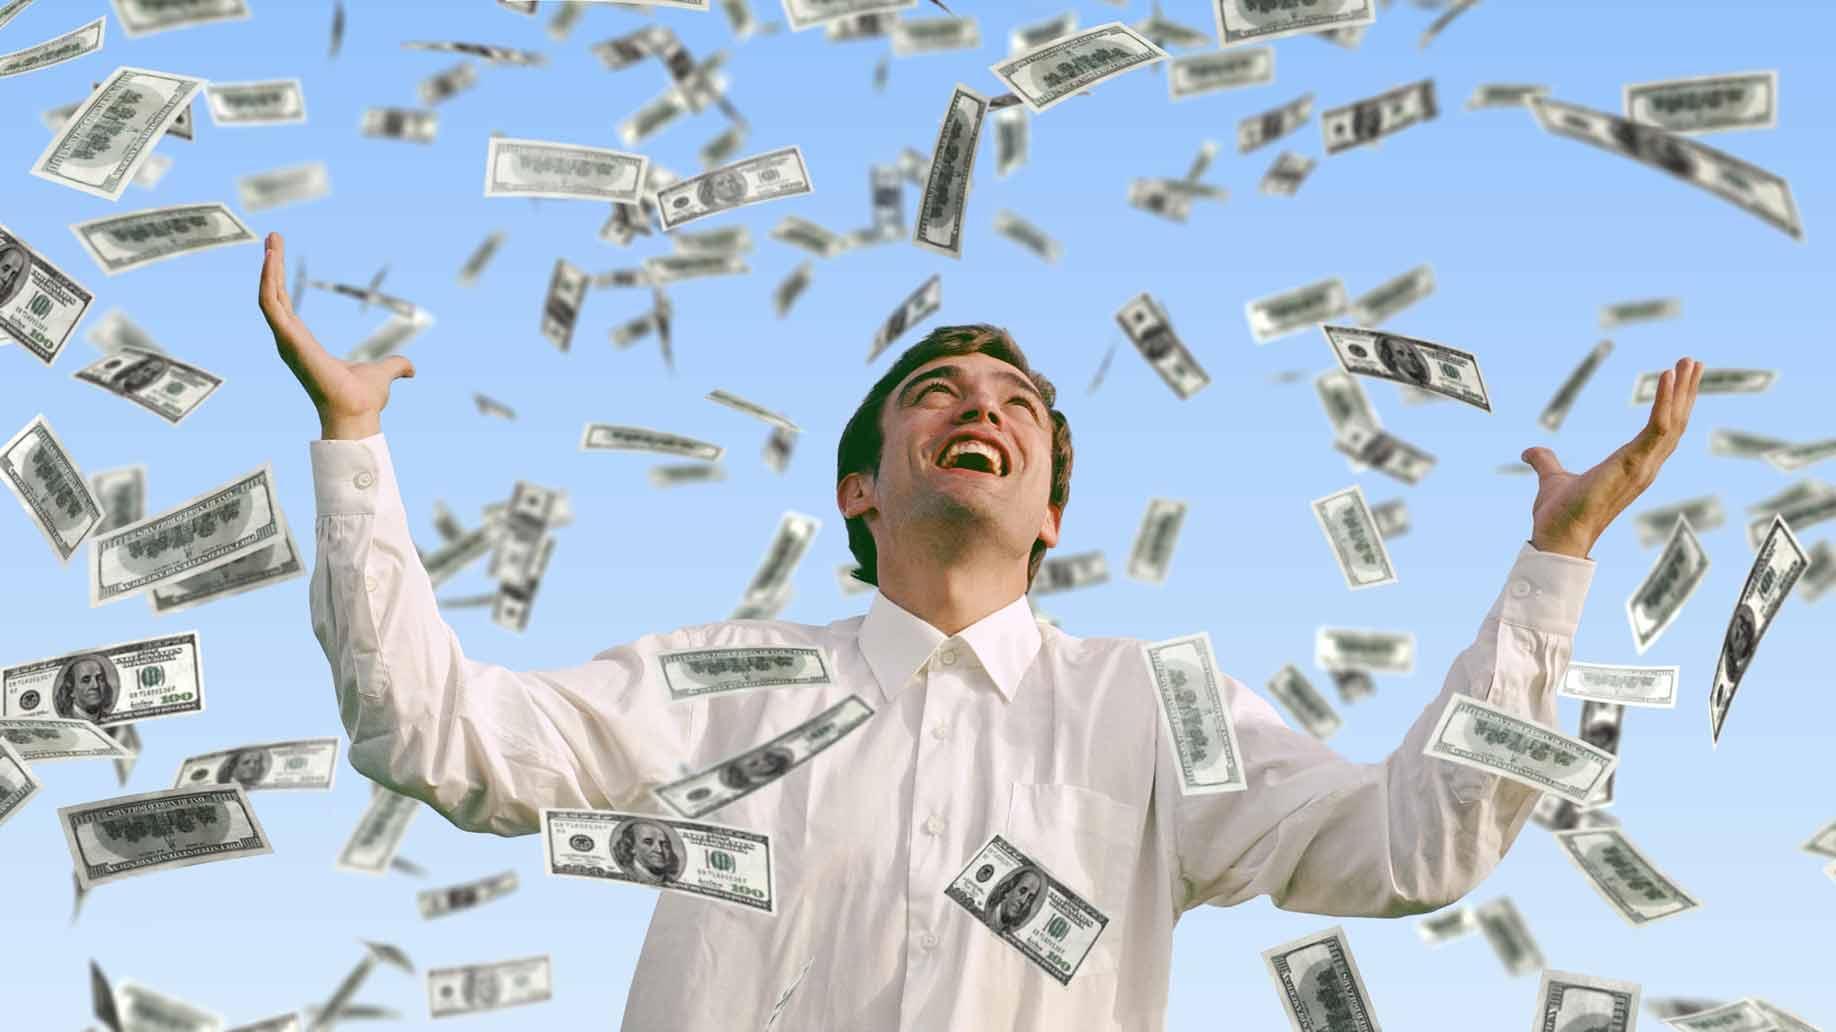 Sharjah man wins AED10million in the Big Ticket Abu Dhabi raffle